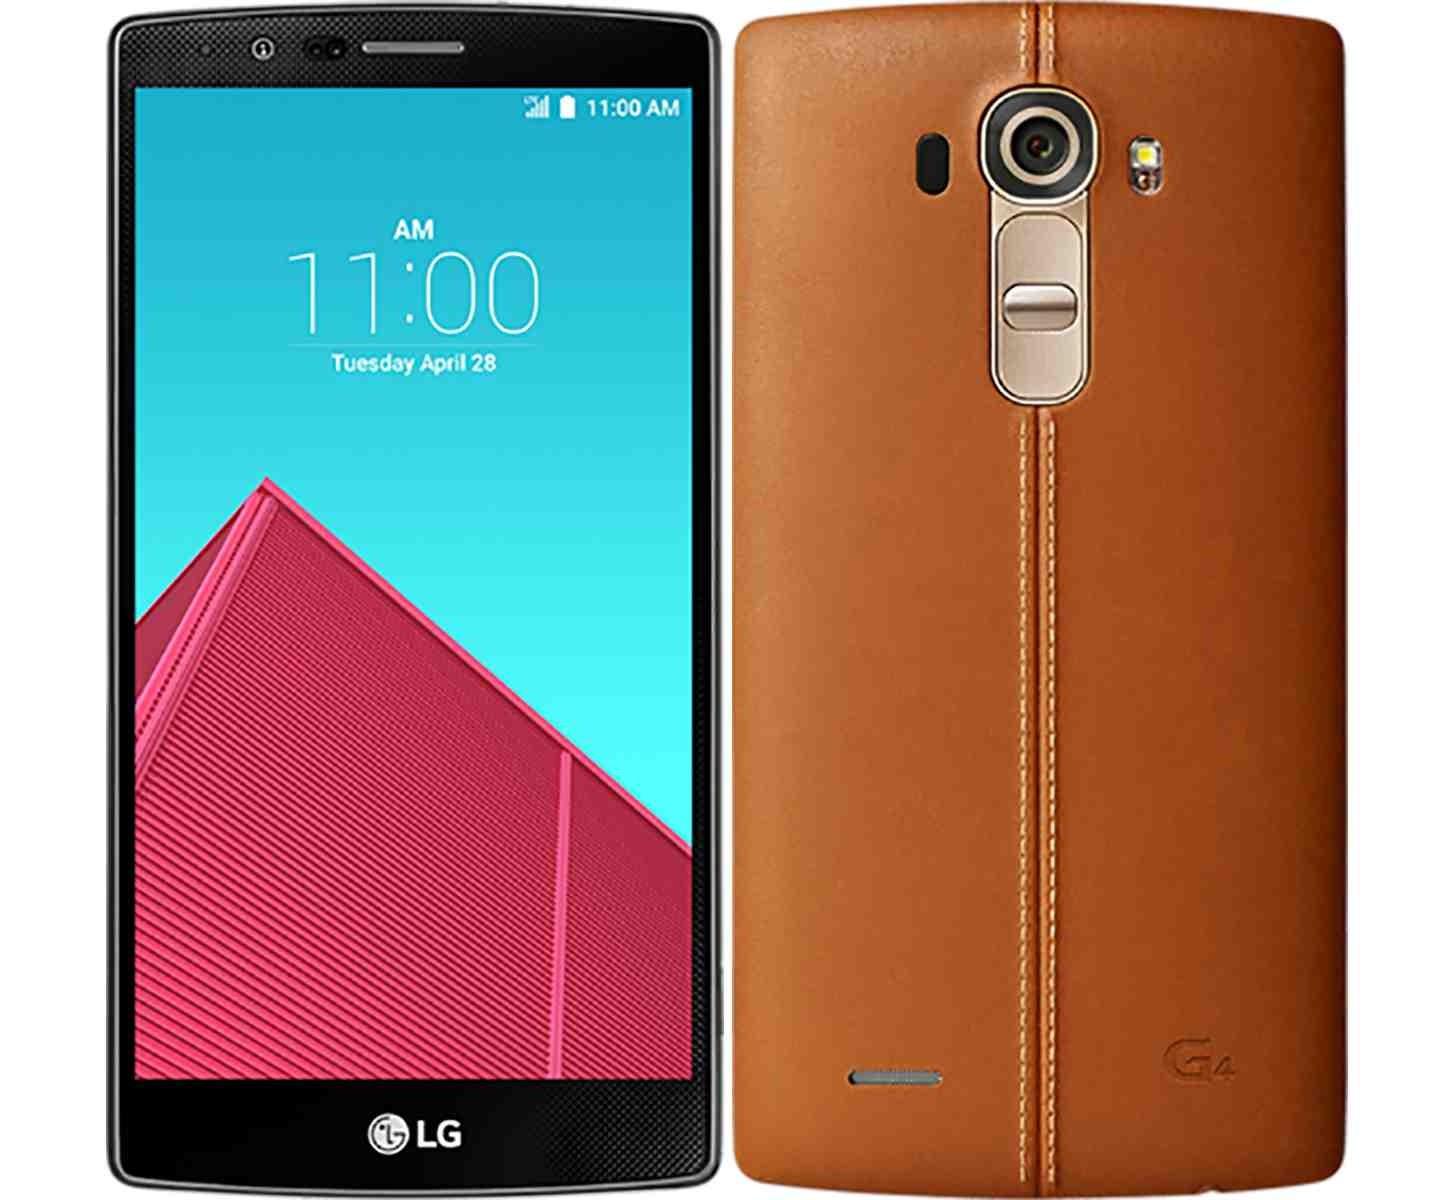 Handphone List Best Phones Of 2015 Lg G4 I Phone 6 Samsung S6